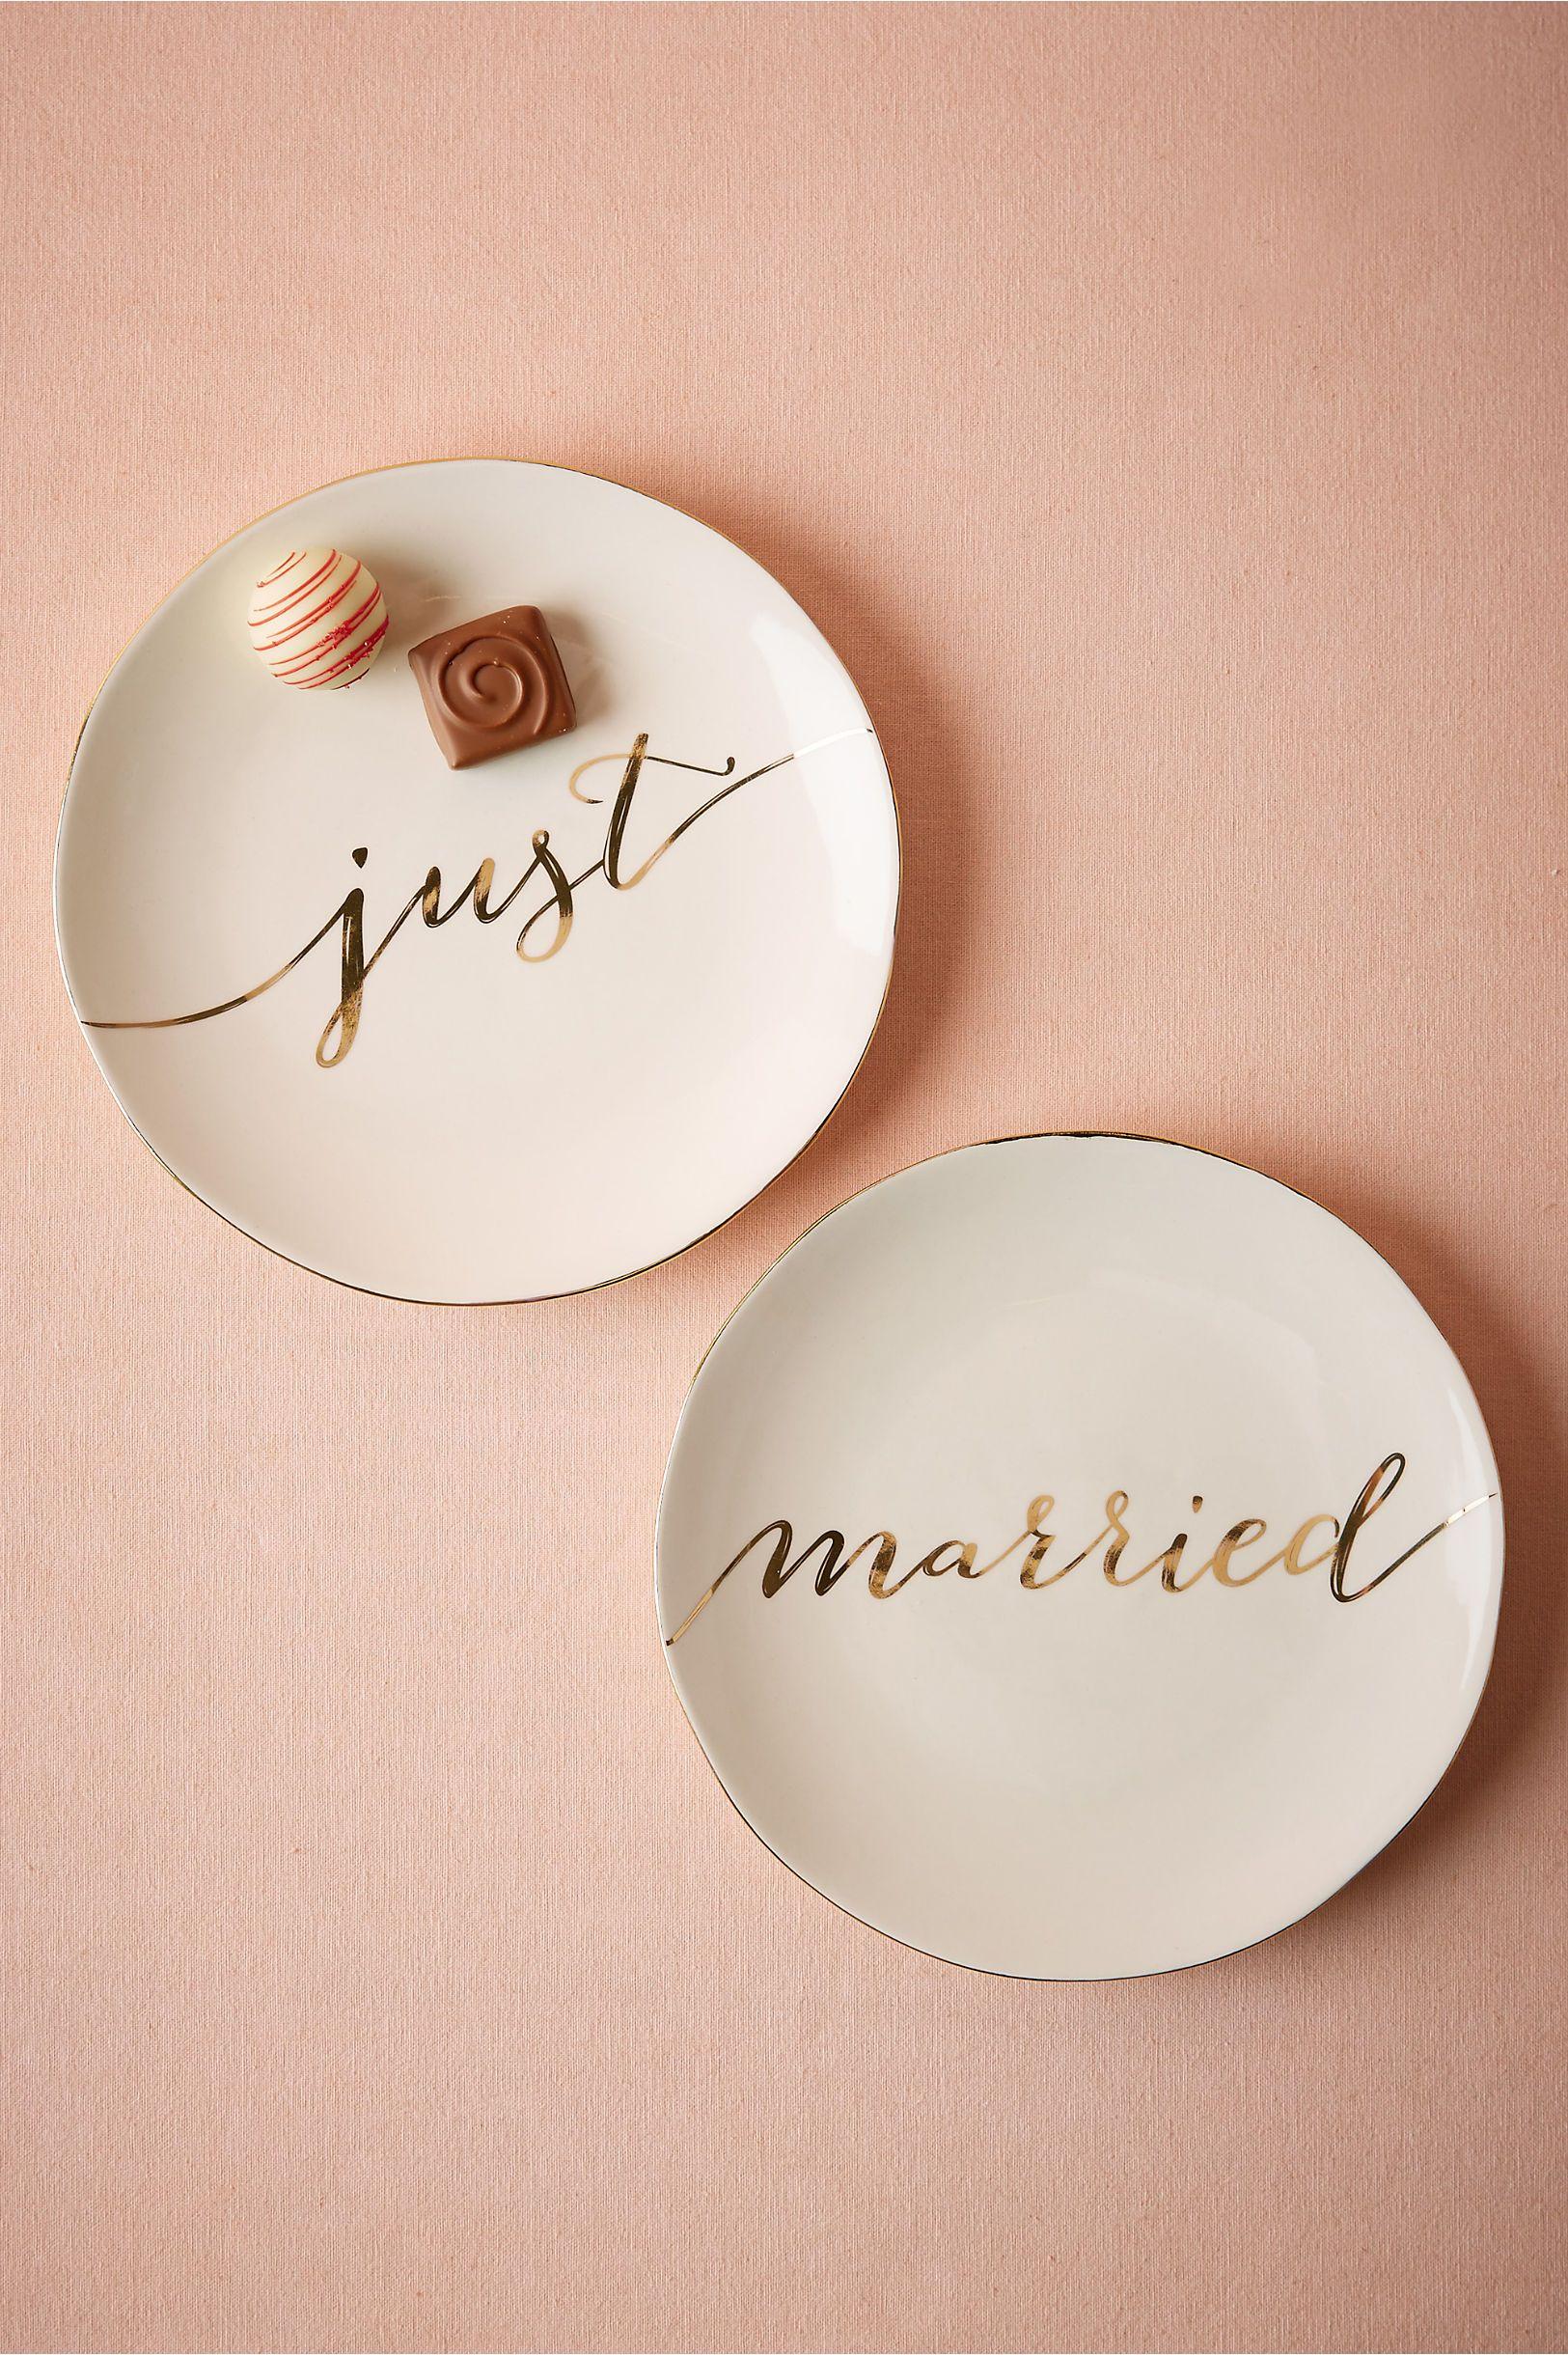 Just Married Dessert Plates (2)